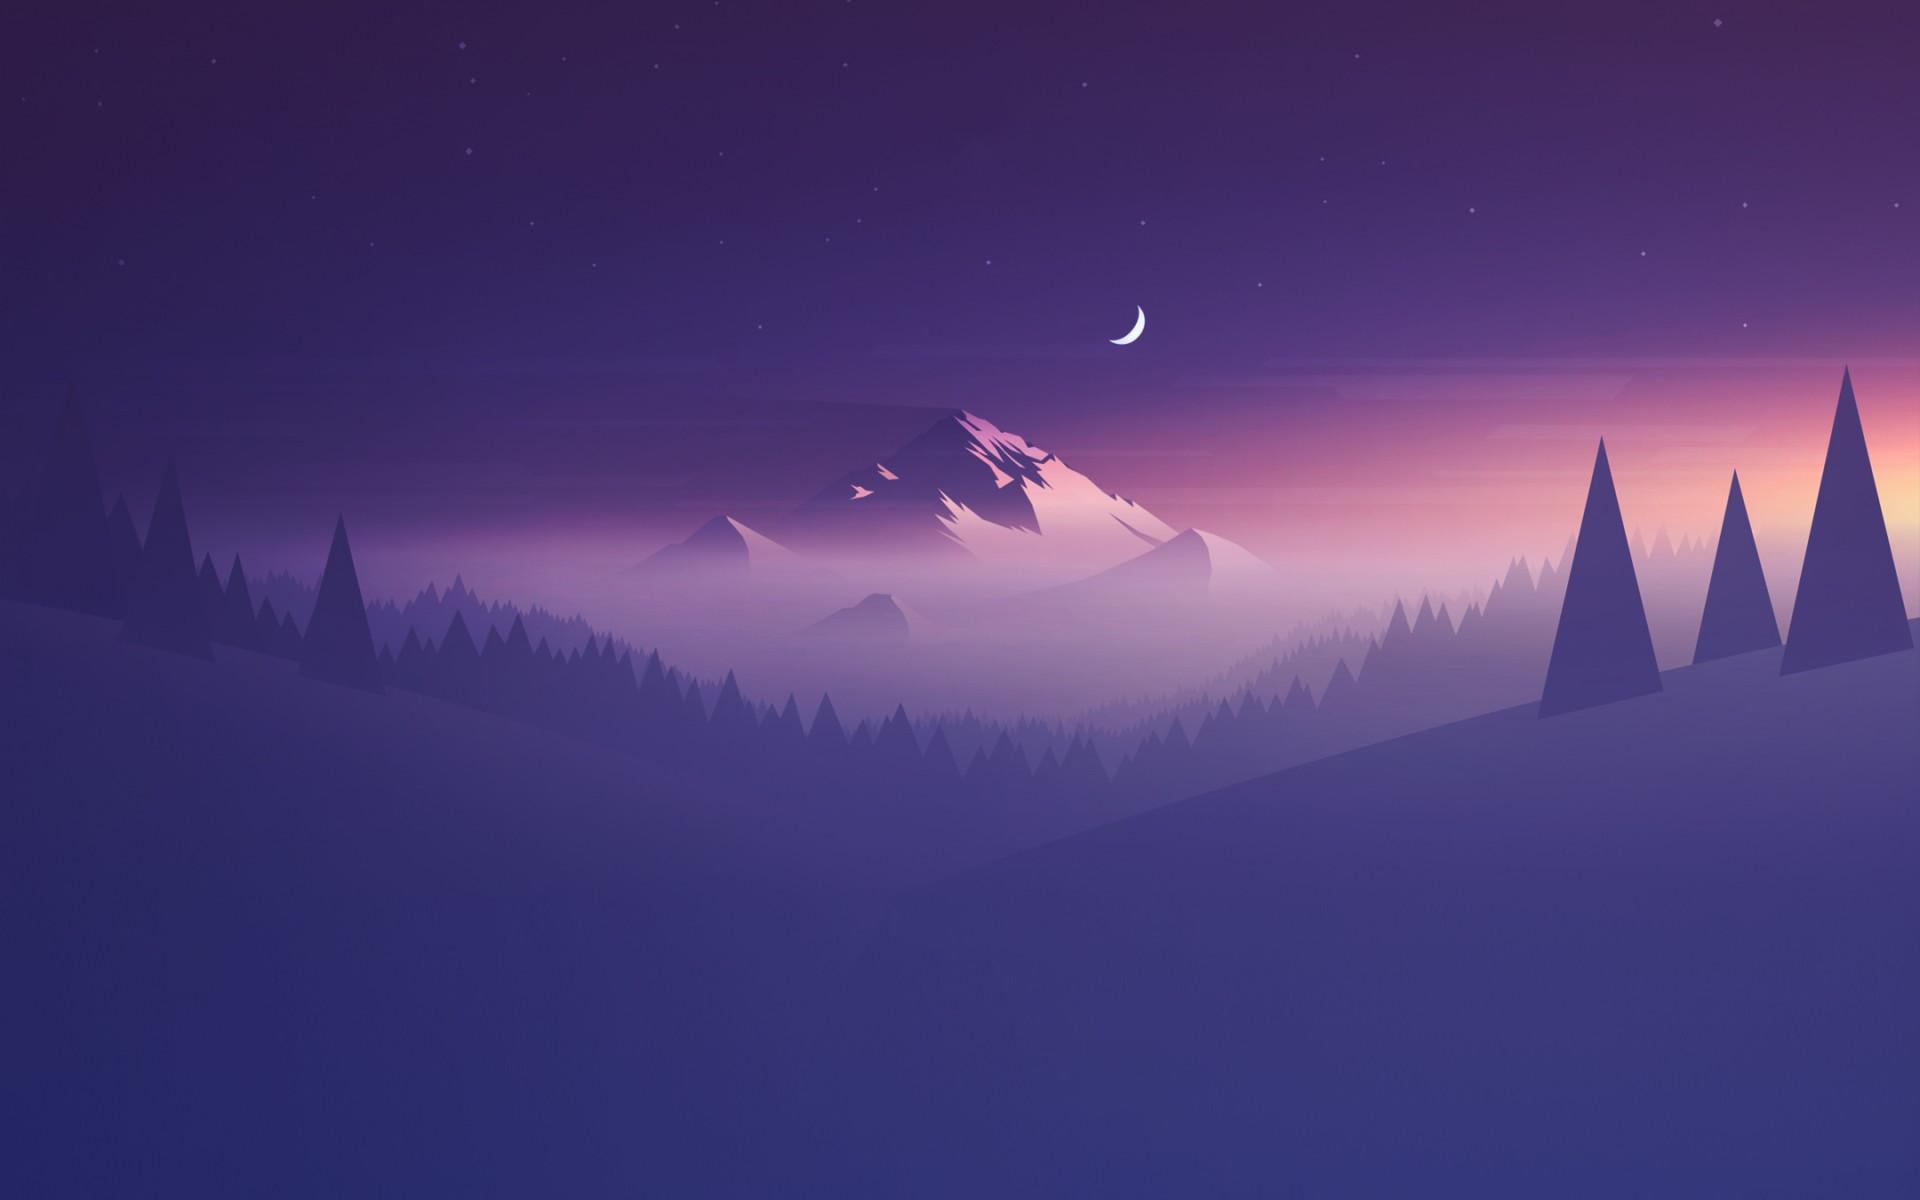 General 1920x1200 mountains trees Moon landscape stars artwork minimalism mist